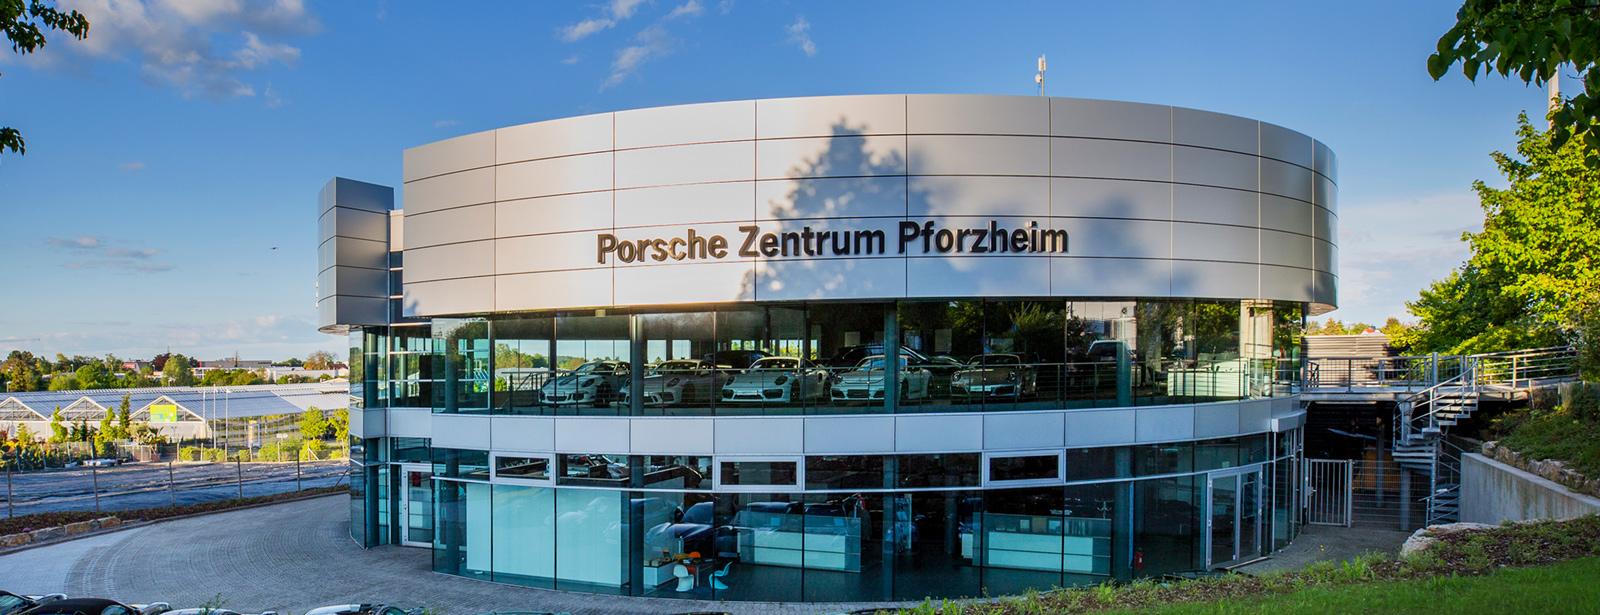 Porsche Centre Pforzheim